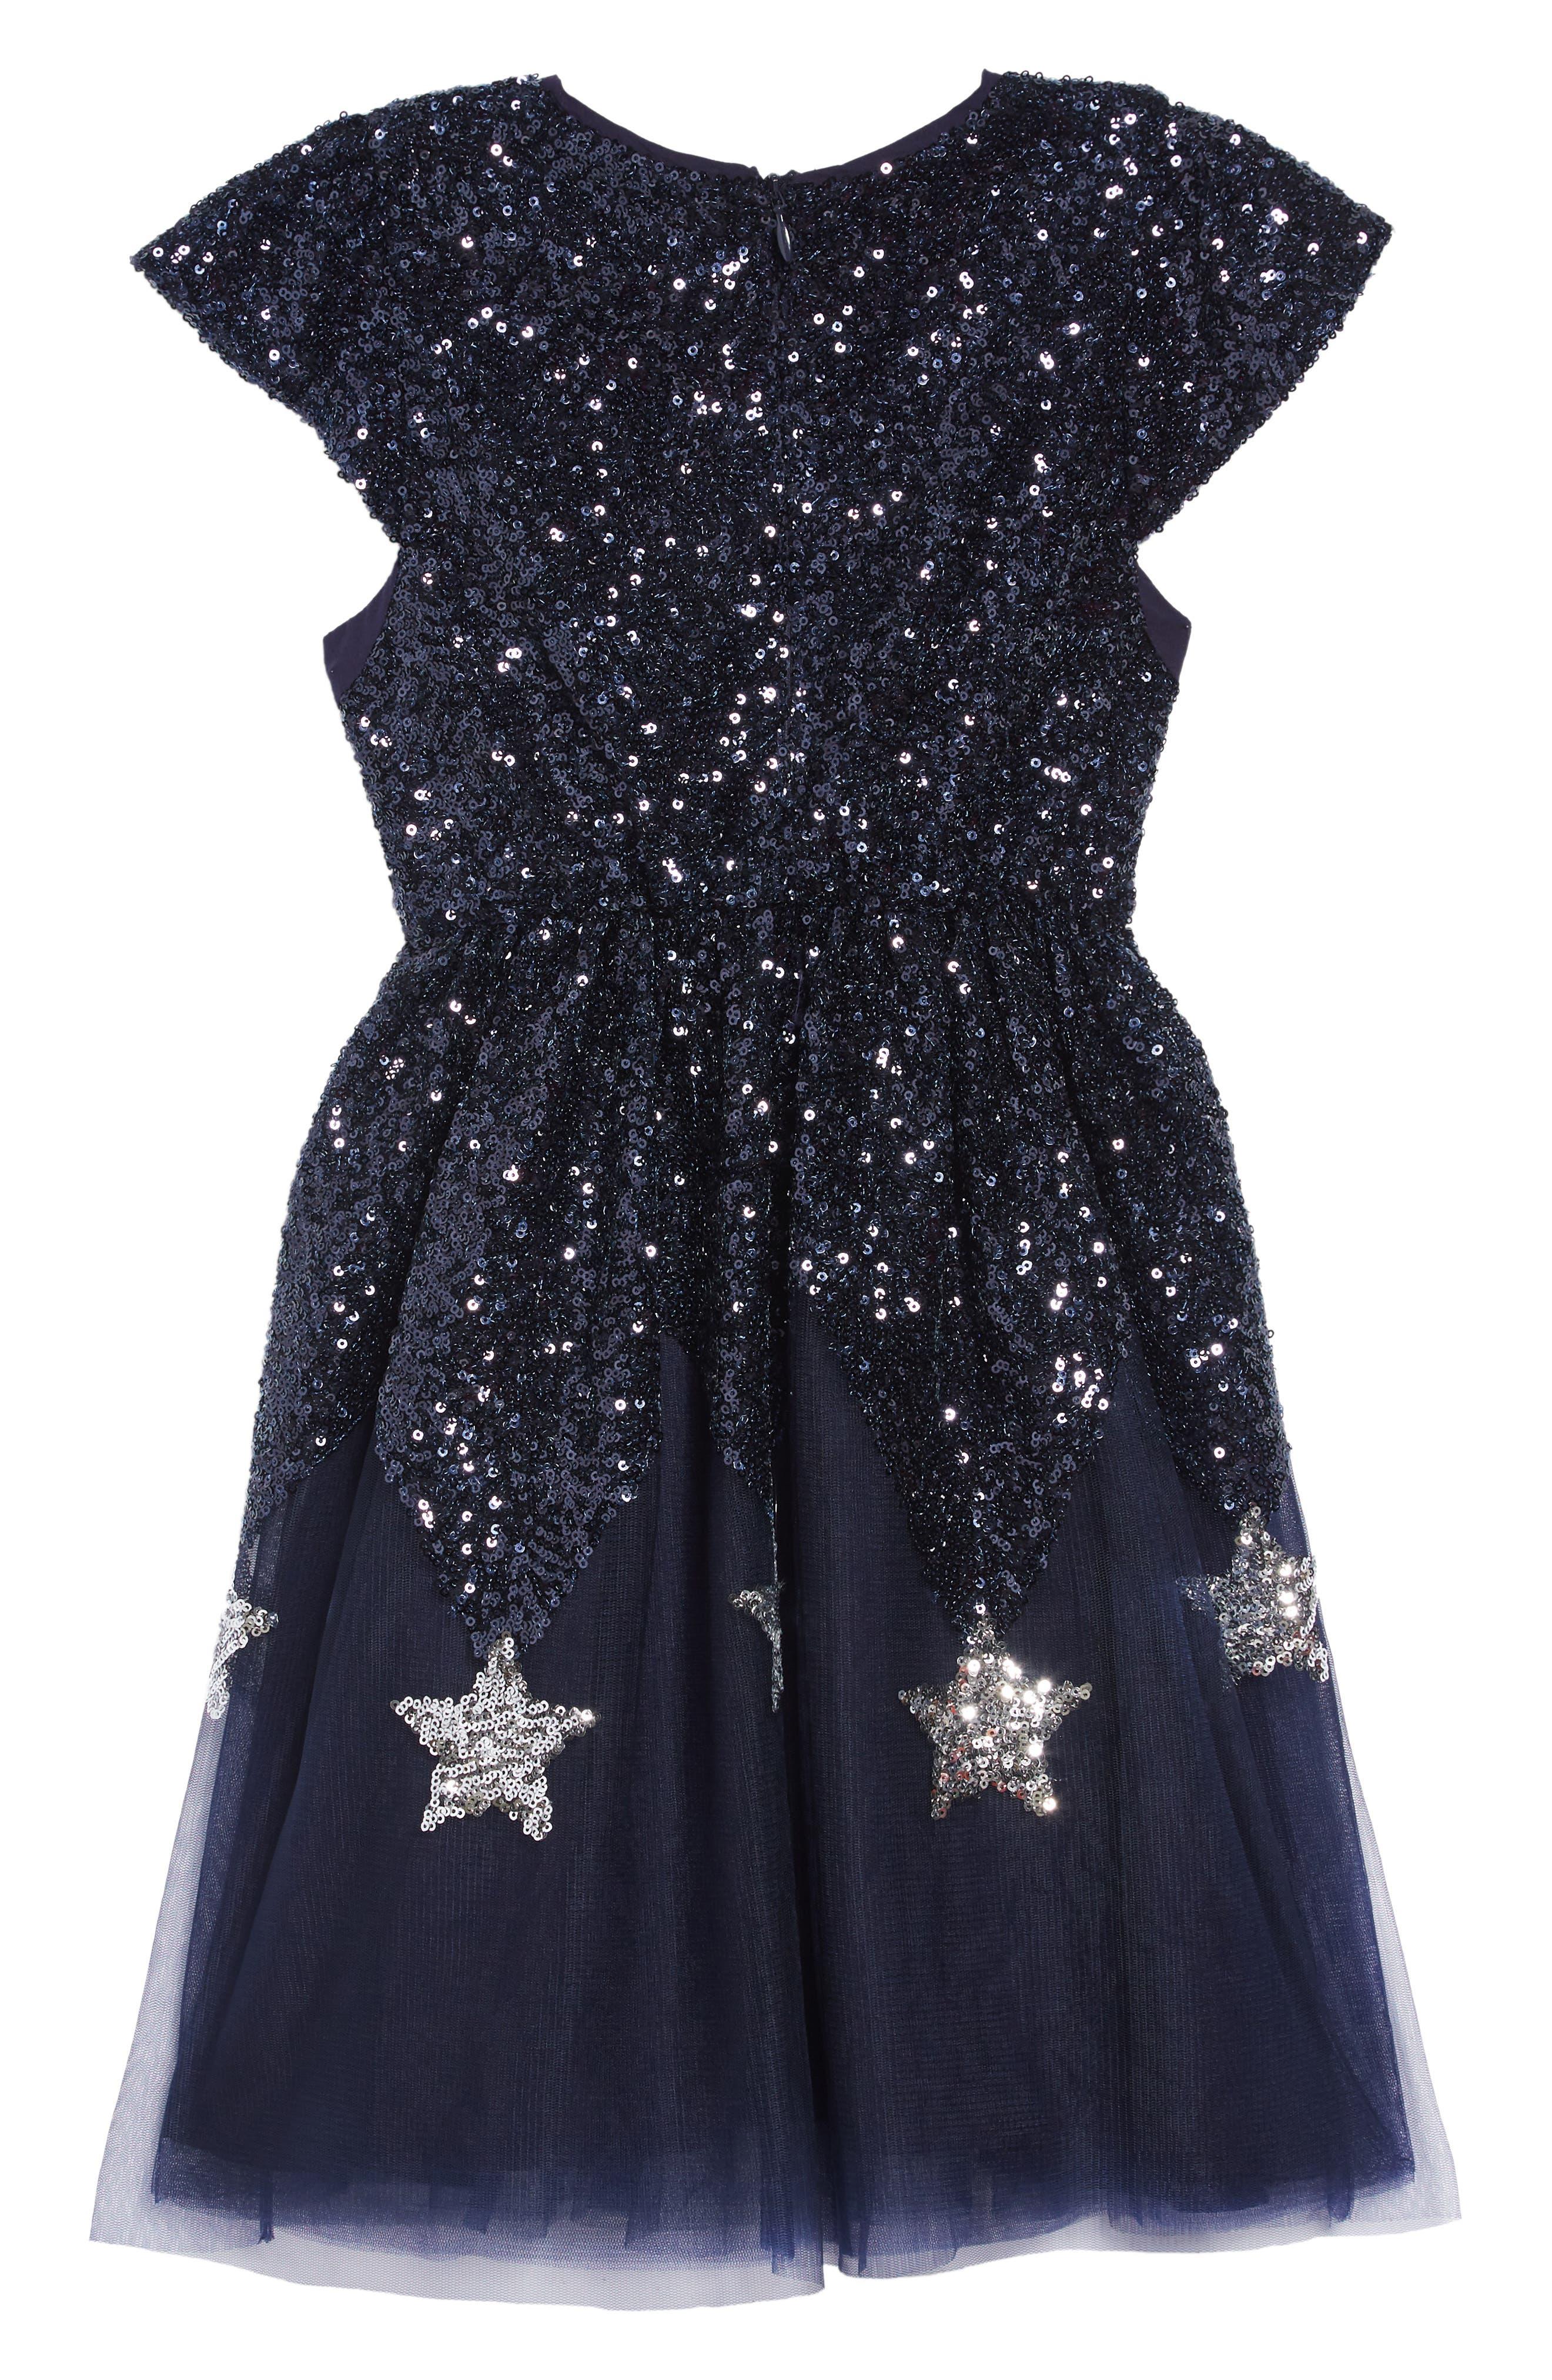 Star Sequin Tulle Dress,                             Alternate thumbnail 2, color,                             NAVY